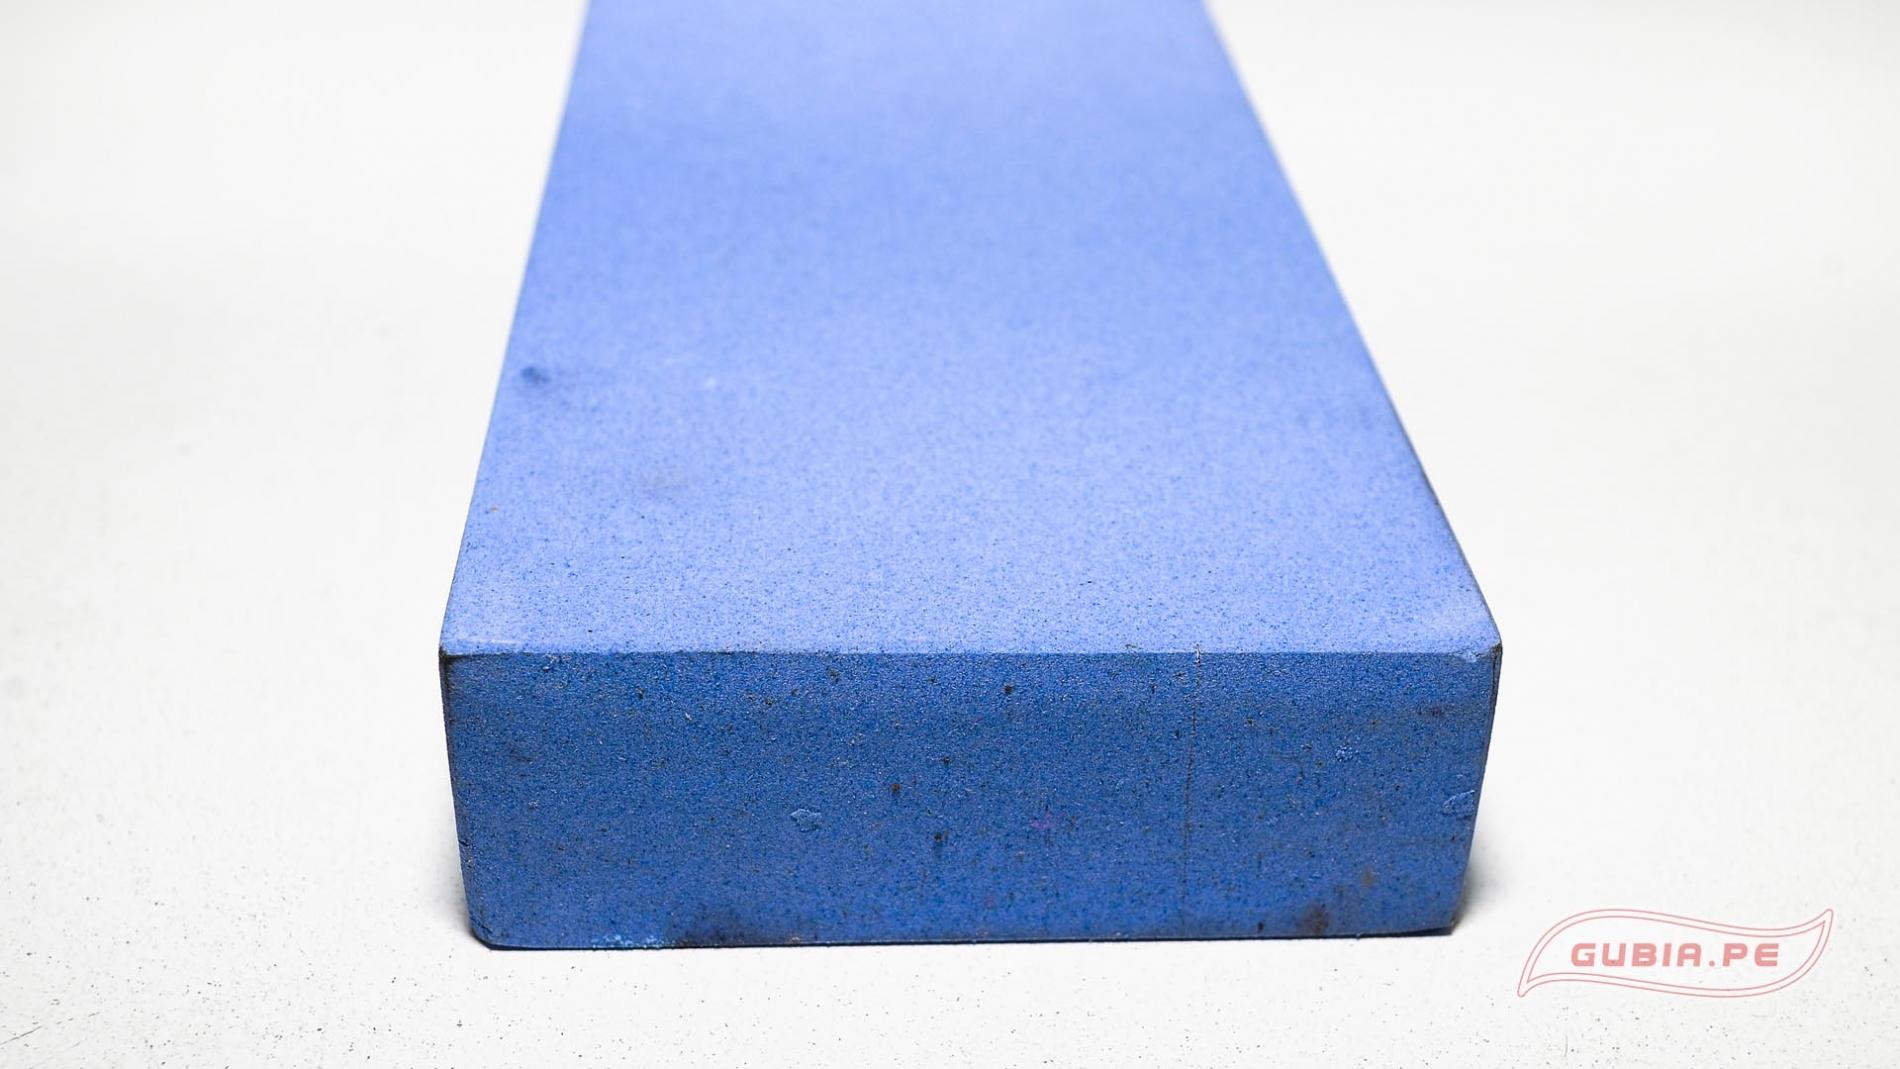 Zische1200-Piedra de afilar 1200 preparar rutina de afilado 250x75x25mm ARKando Zische-max-2.